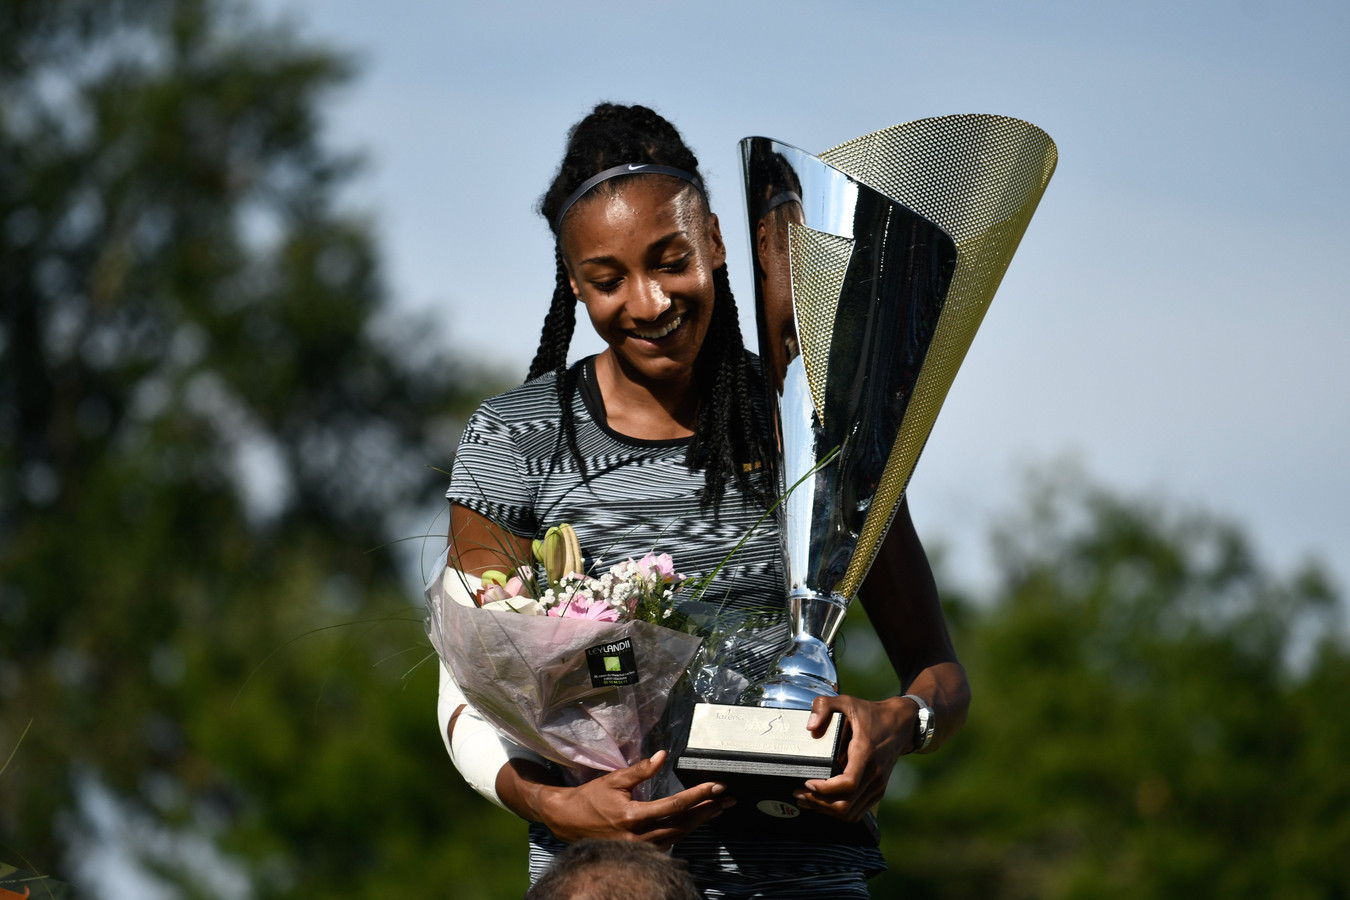 Podium Femme Vainqueur Nafissatou Thiam (bel) ATHLETISME : 2emeJournee du Decastar - Talence - 23/06/2019 © PanoramiC ! only BELGIUM !